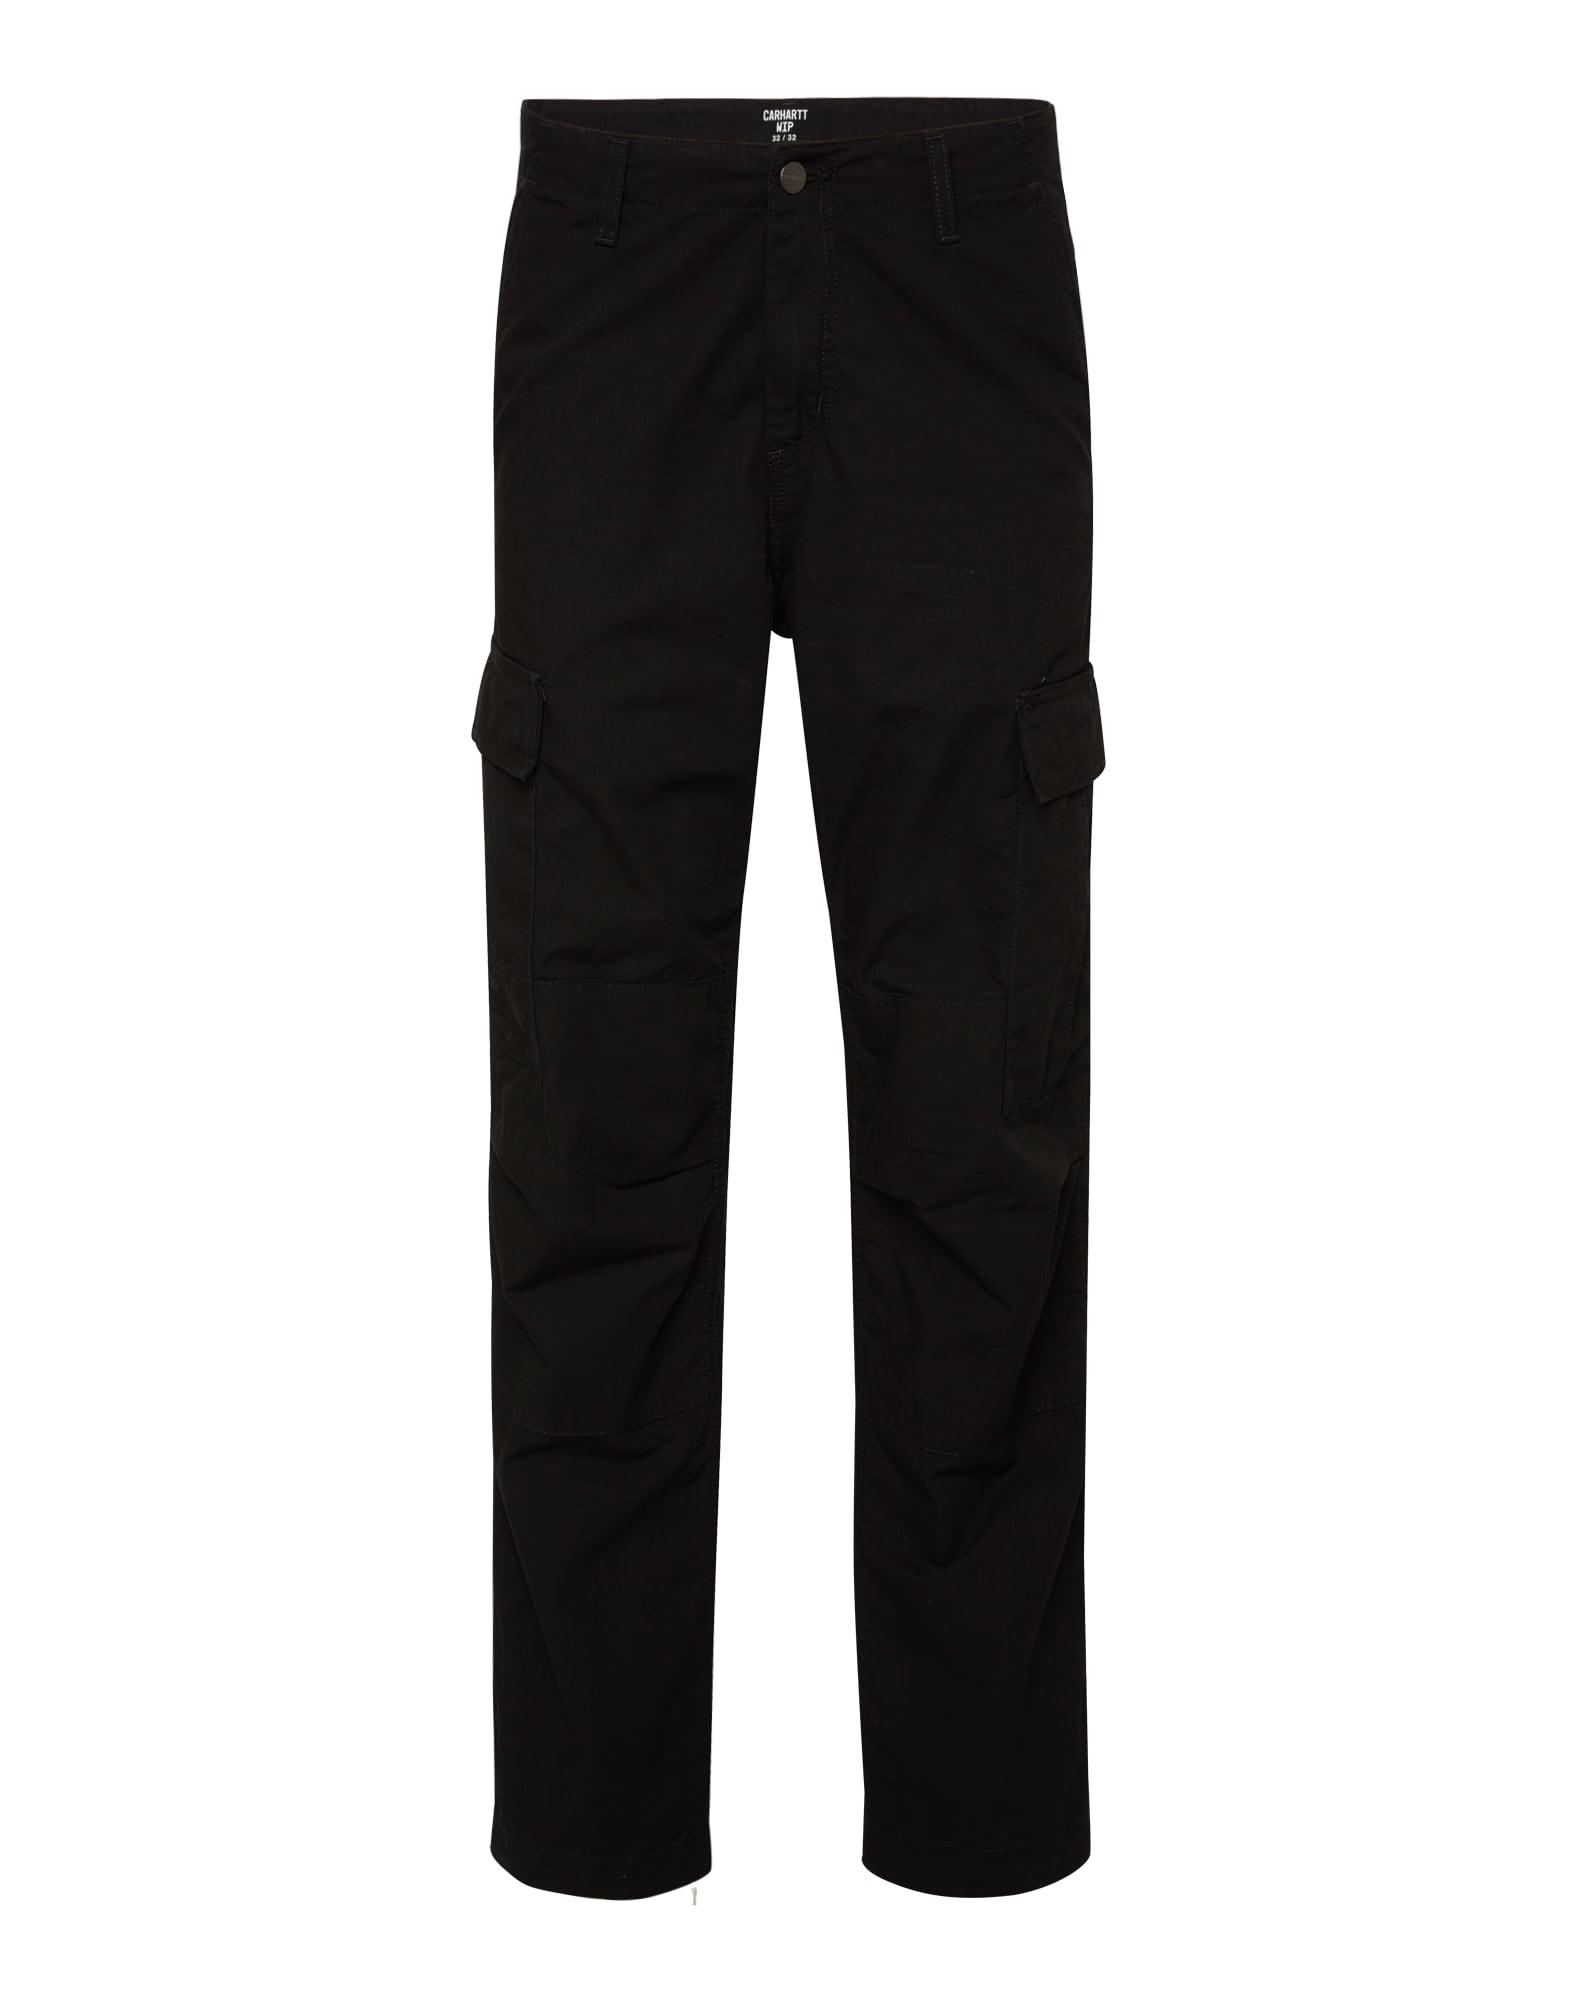 Carhartt WIP Laisvo stiliaus kelnės